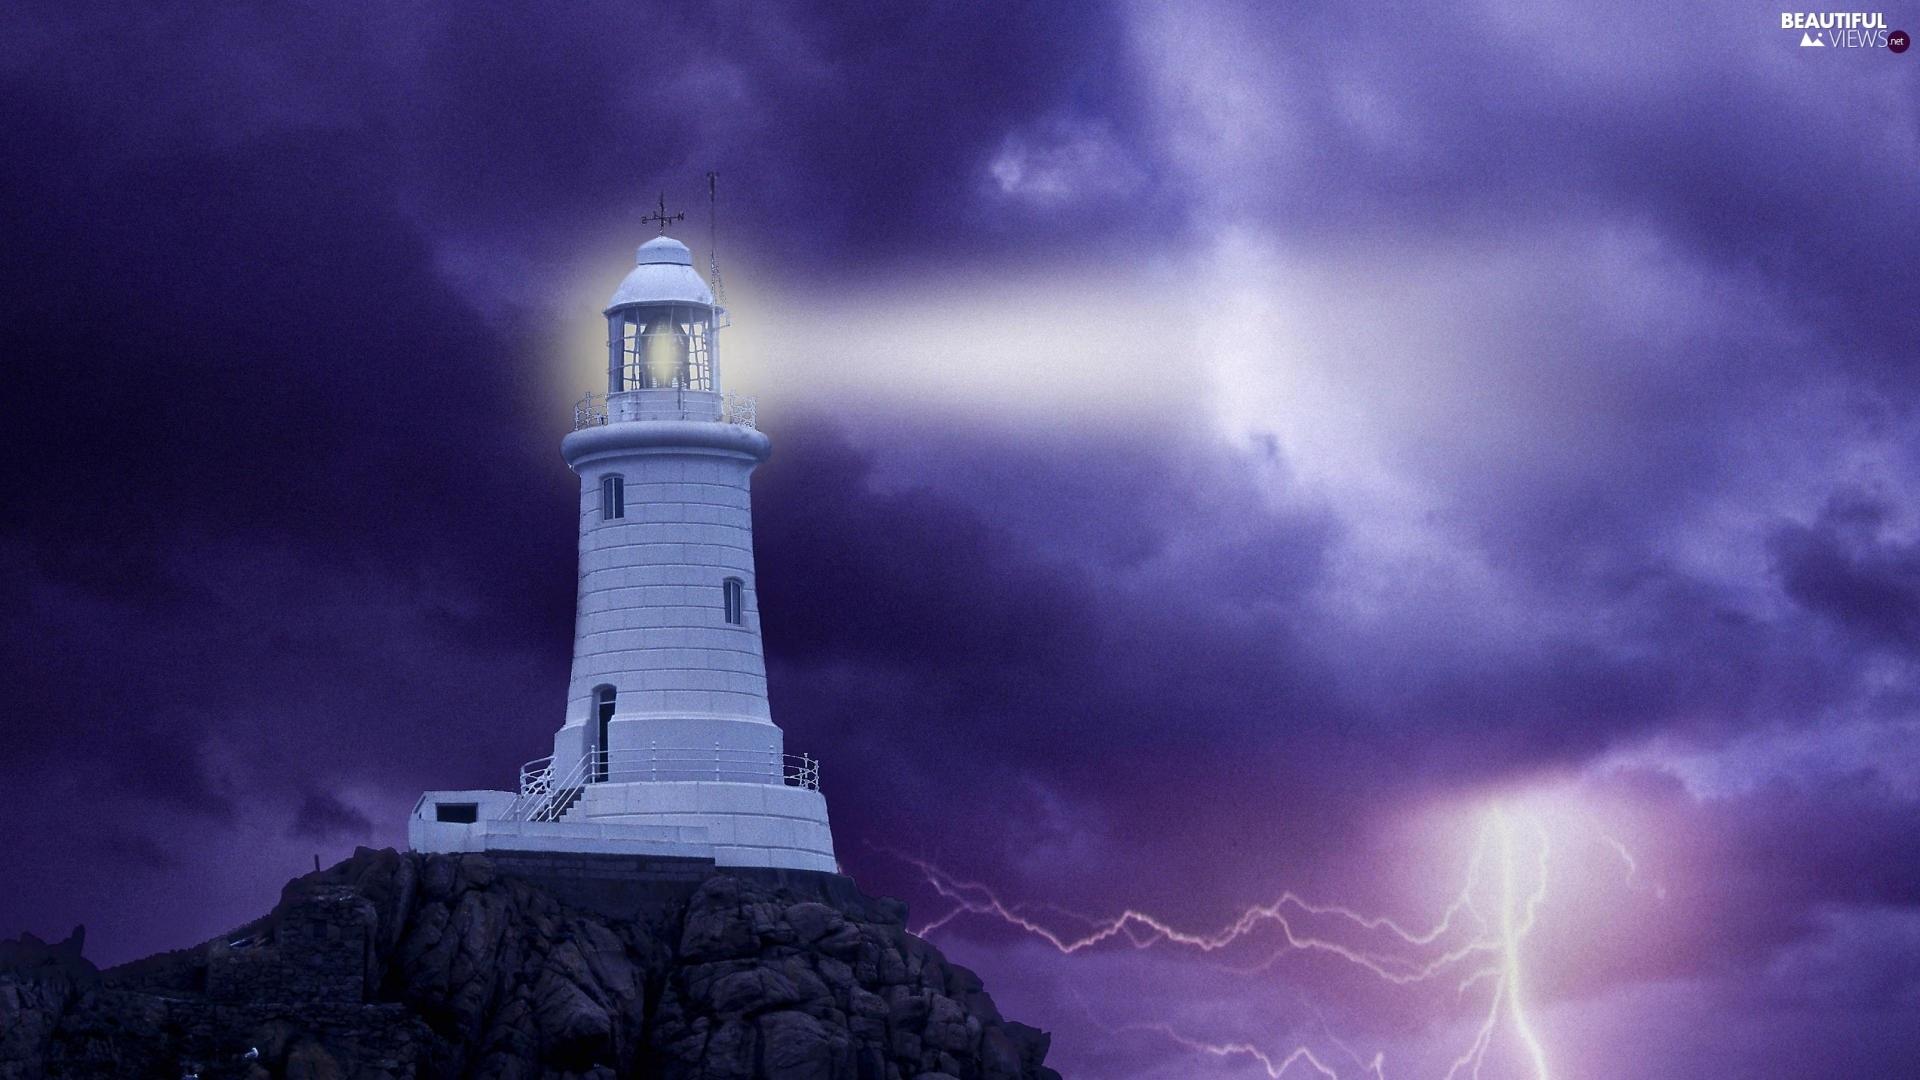 Lighthouse, Storm, thunderbolt, maritime - Beautiful views ...